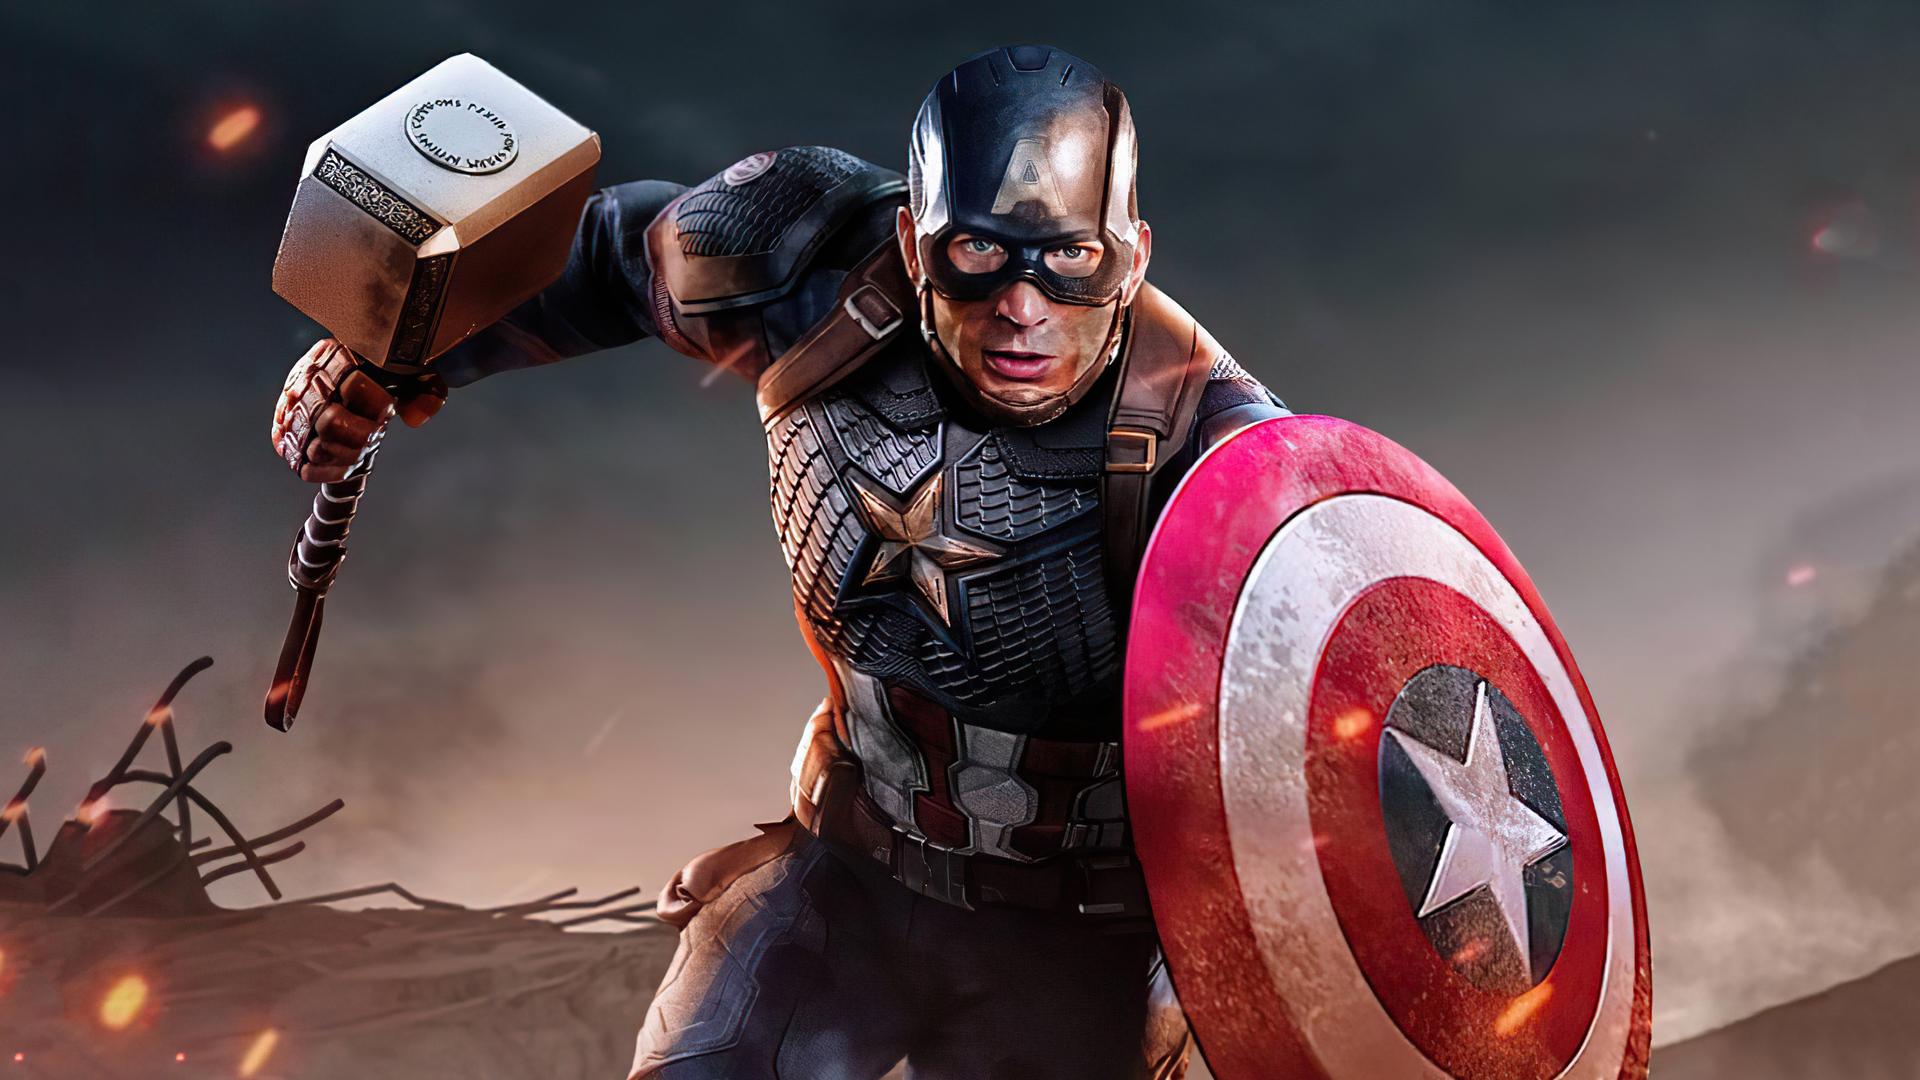 1920x1080 Captain America 2020 4k Laptop Full HD 1080P HD ...